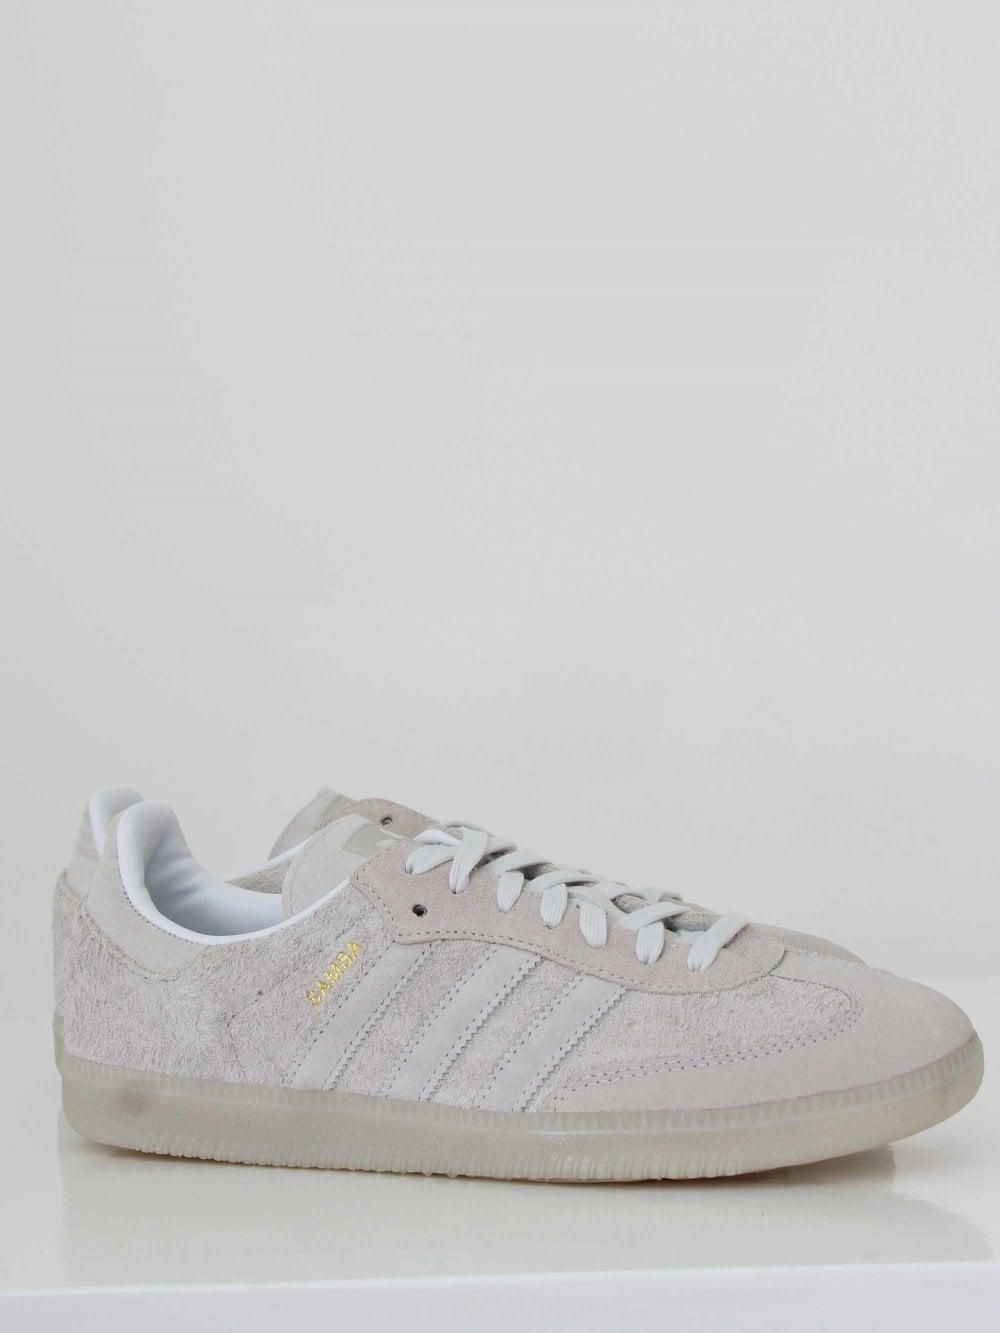 Adidas Samba OG in Crystal White